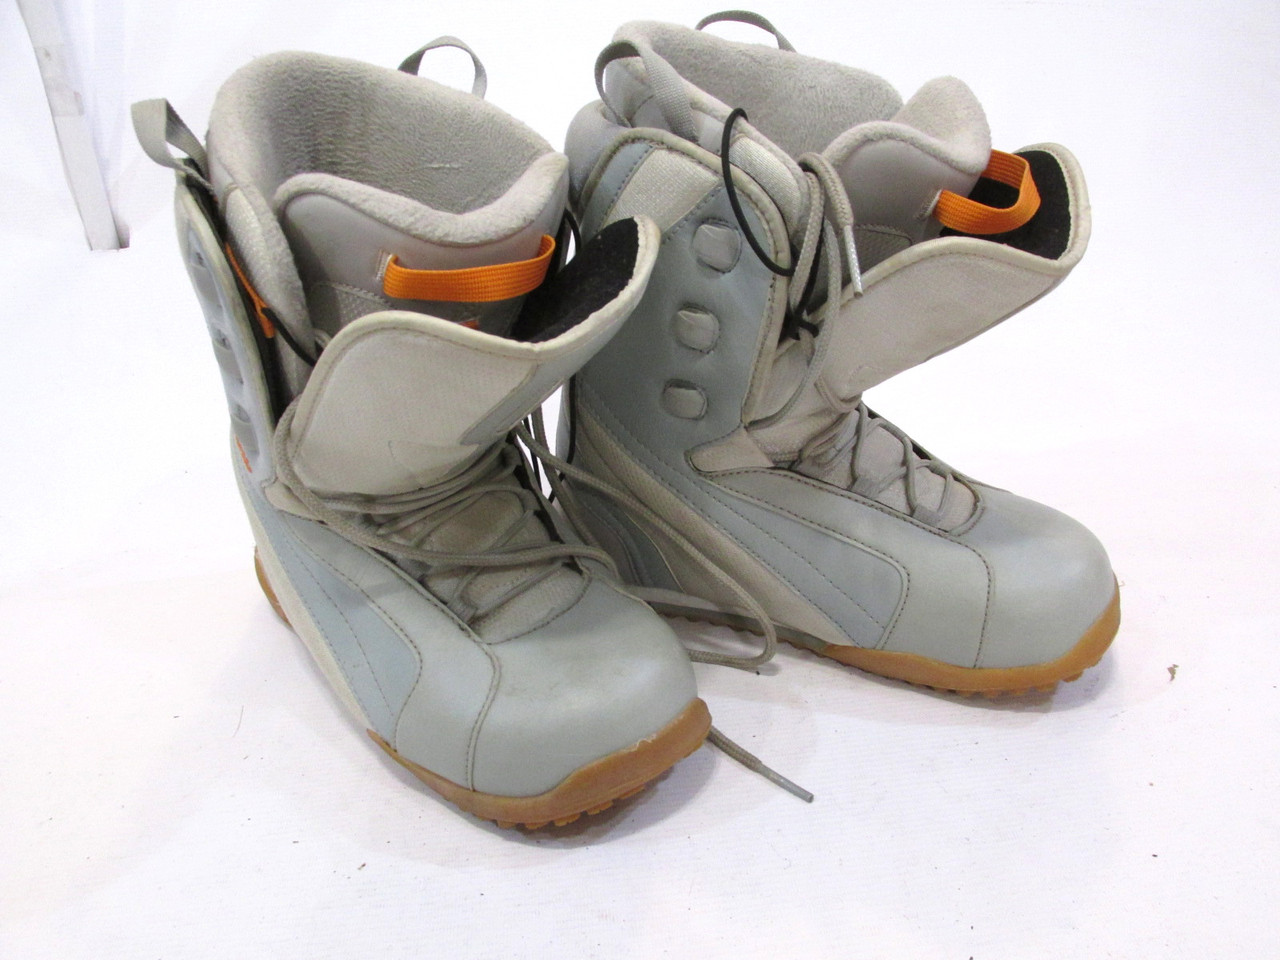 Ботинки для сноуборда Skyrock, 42 (27 см), Кожзам, Отл сост!